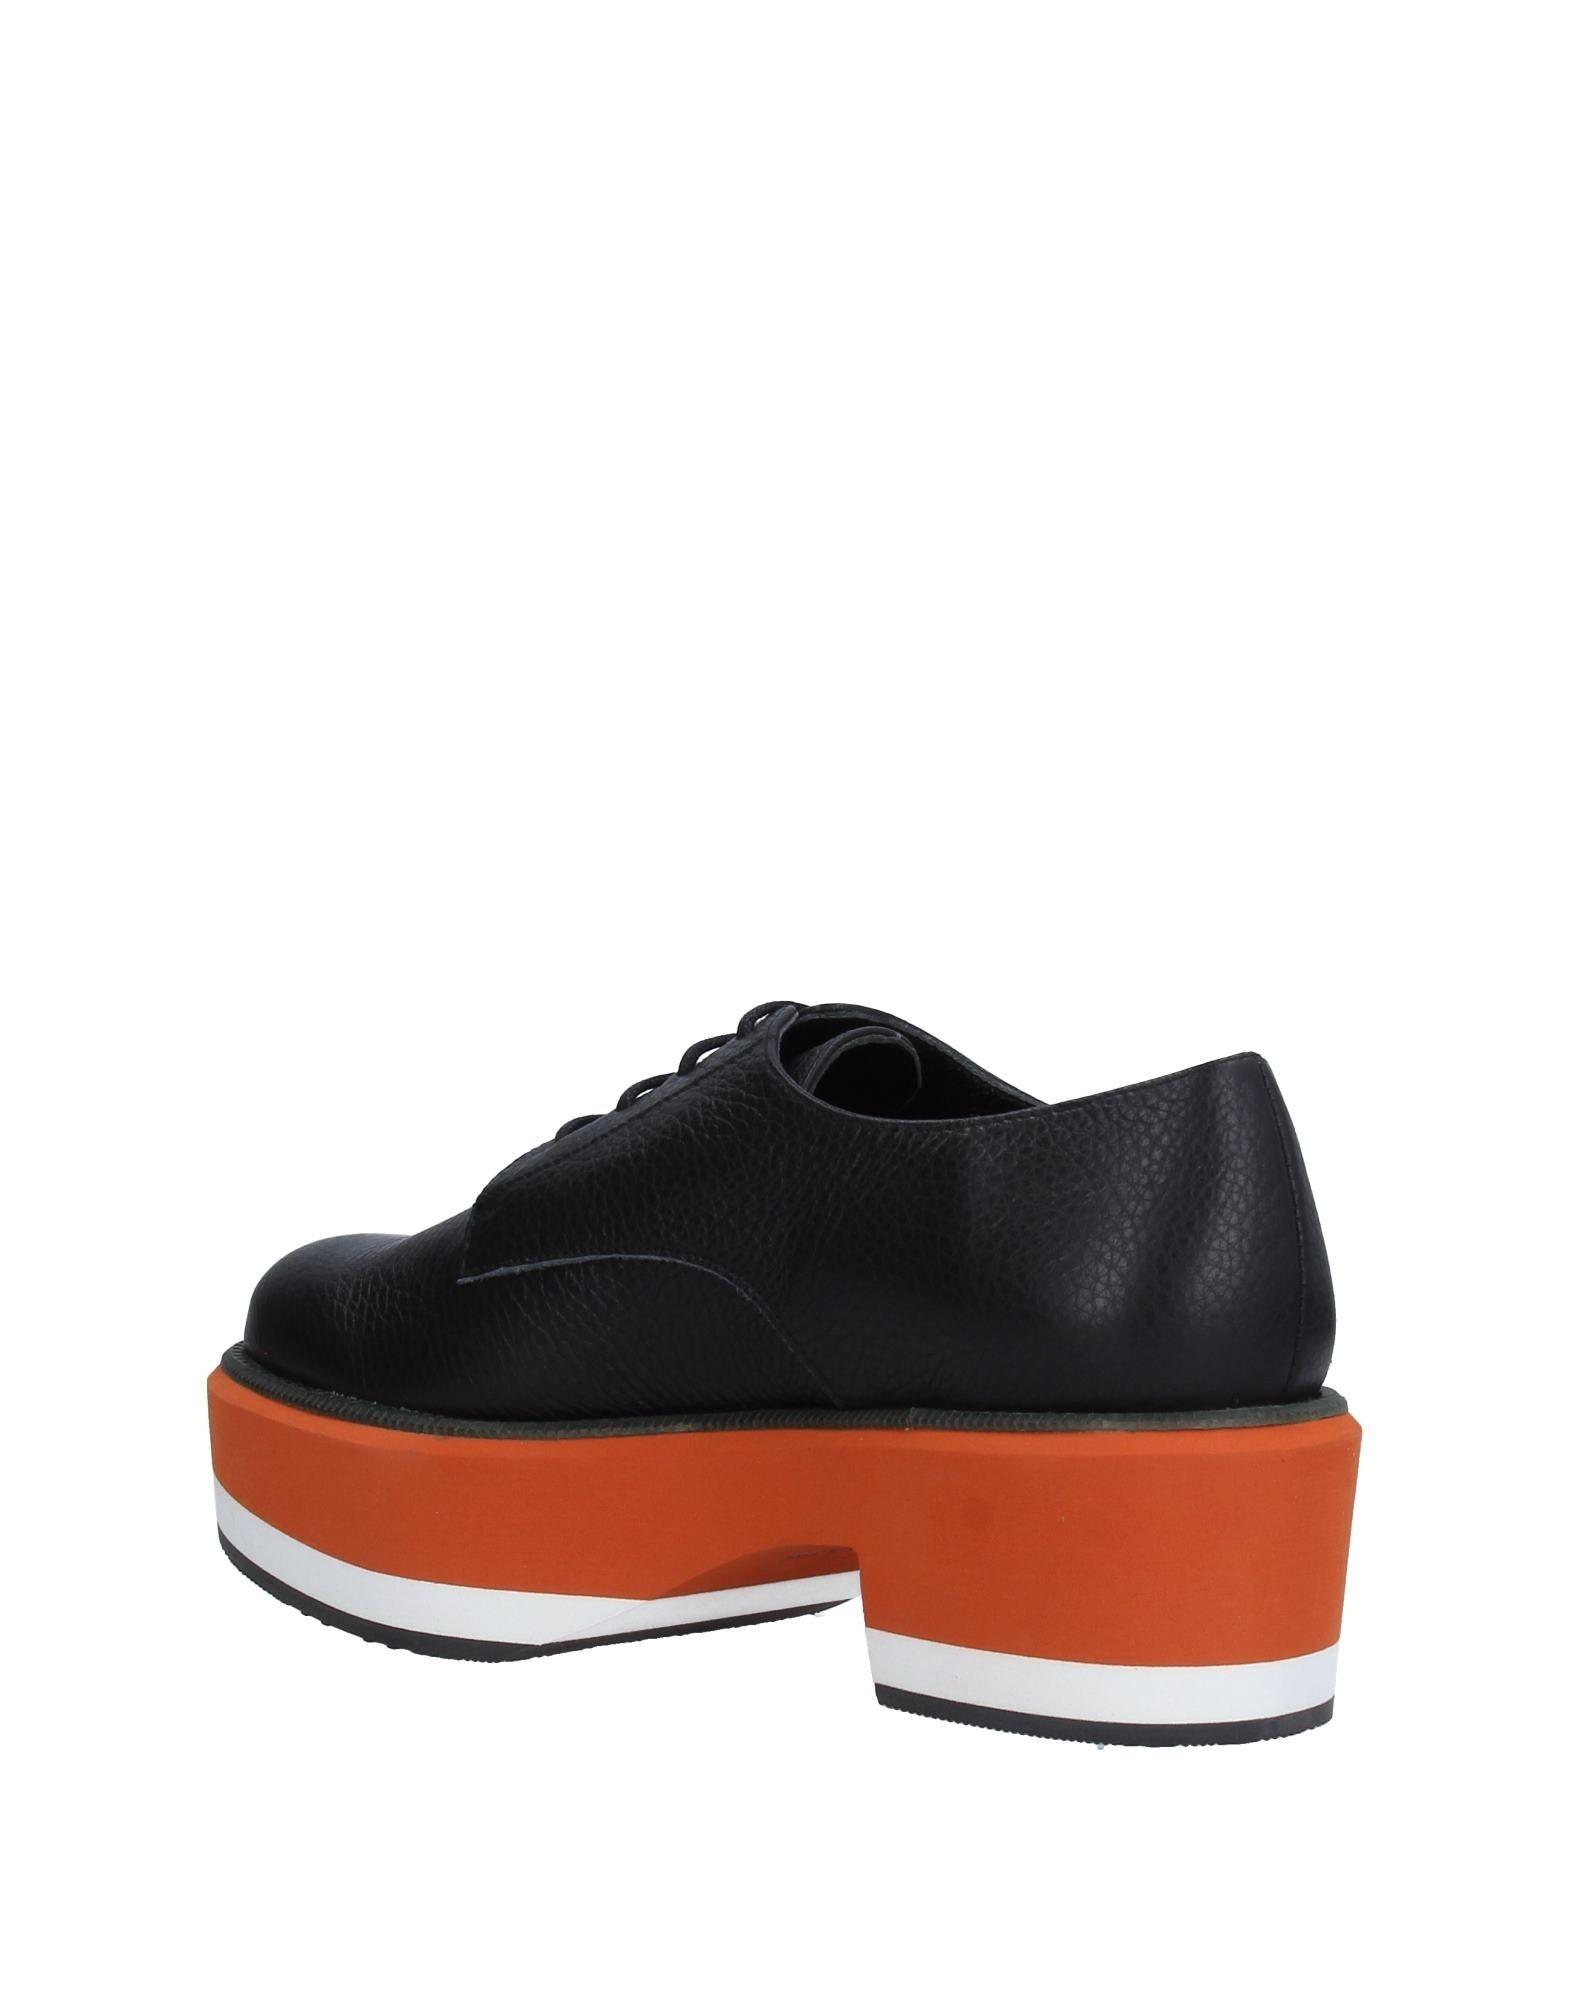 Paloma 11224242IT Barceló Schnürschuhe Damen  11224242IT Paloma Gute Qualität beliebte Schuhe d4ed7c